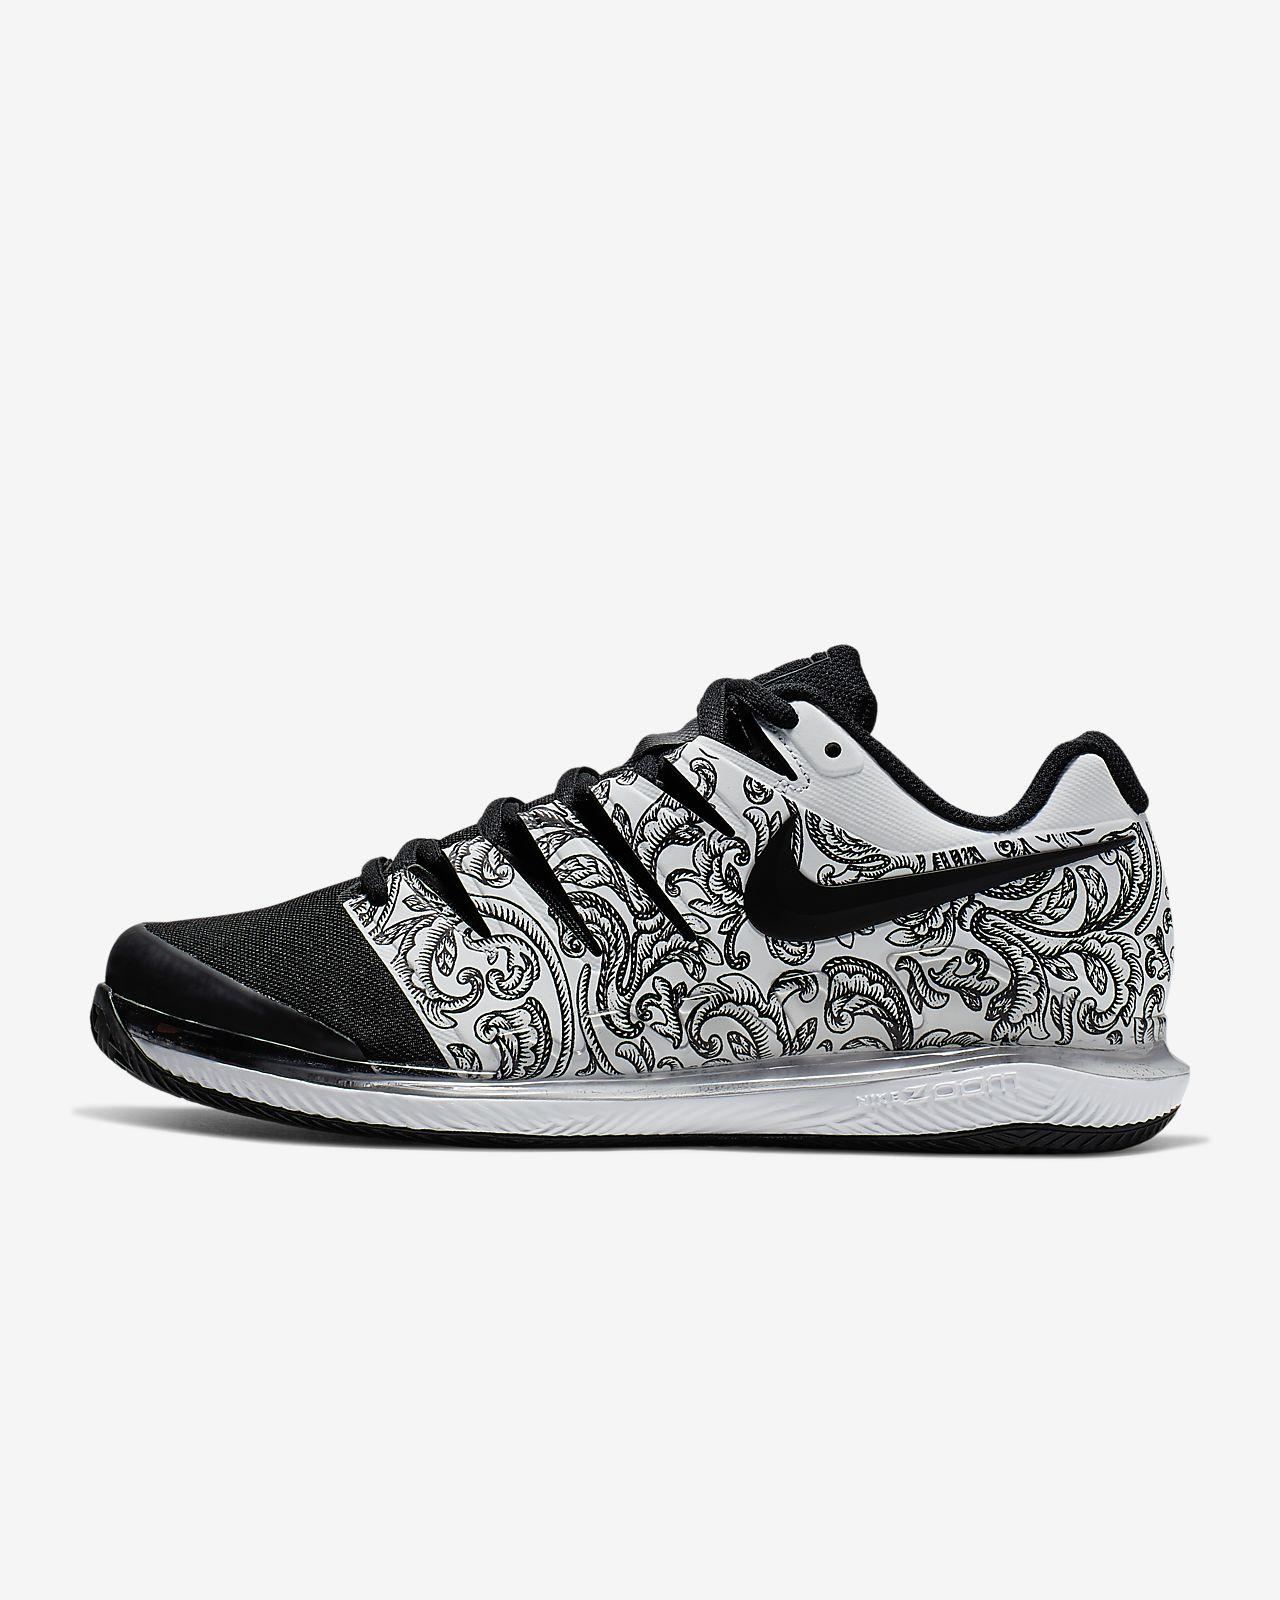 brand new a5757 4a28c Women s Tennis Shoe. Nike Air Zoom Vapor X Clay